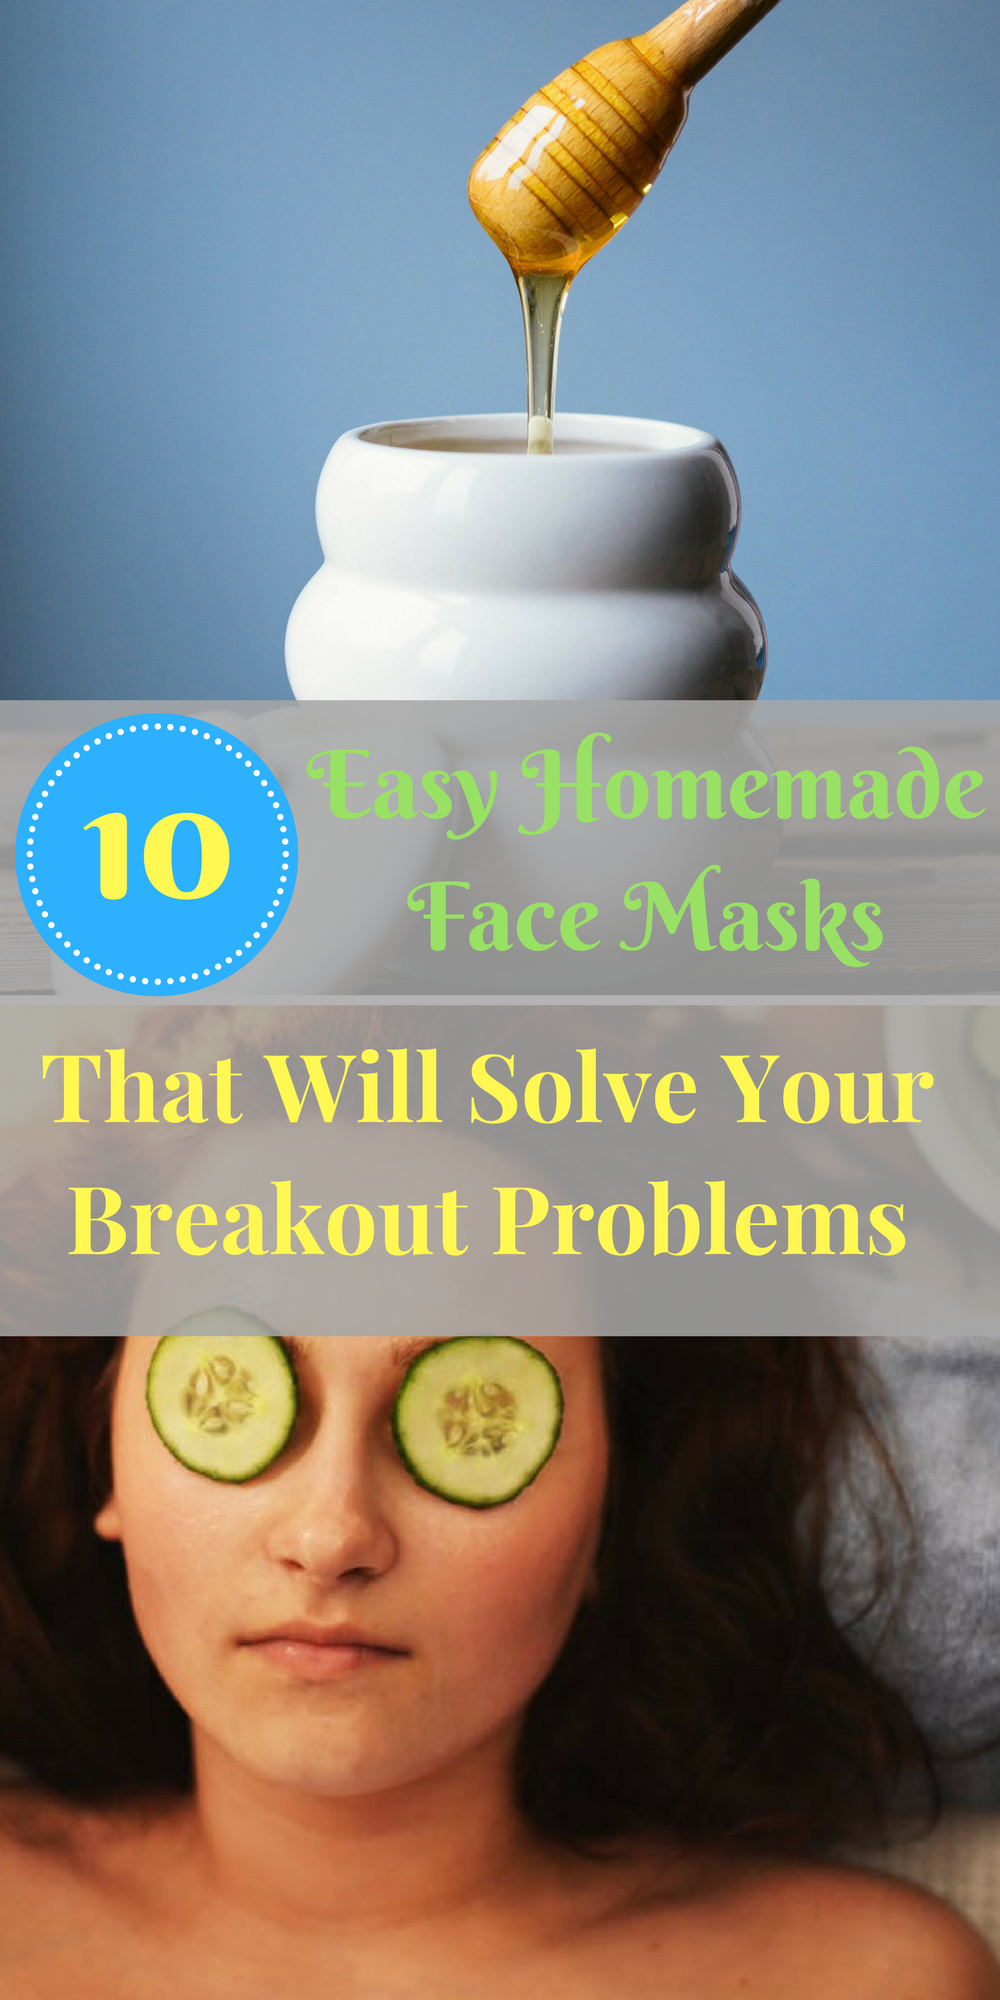 10 Incredibly Easy Homemade Face Masks Easy homemade